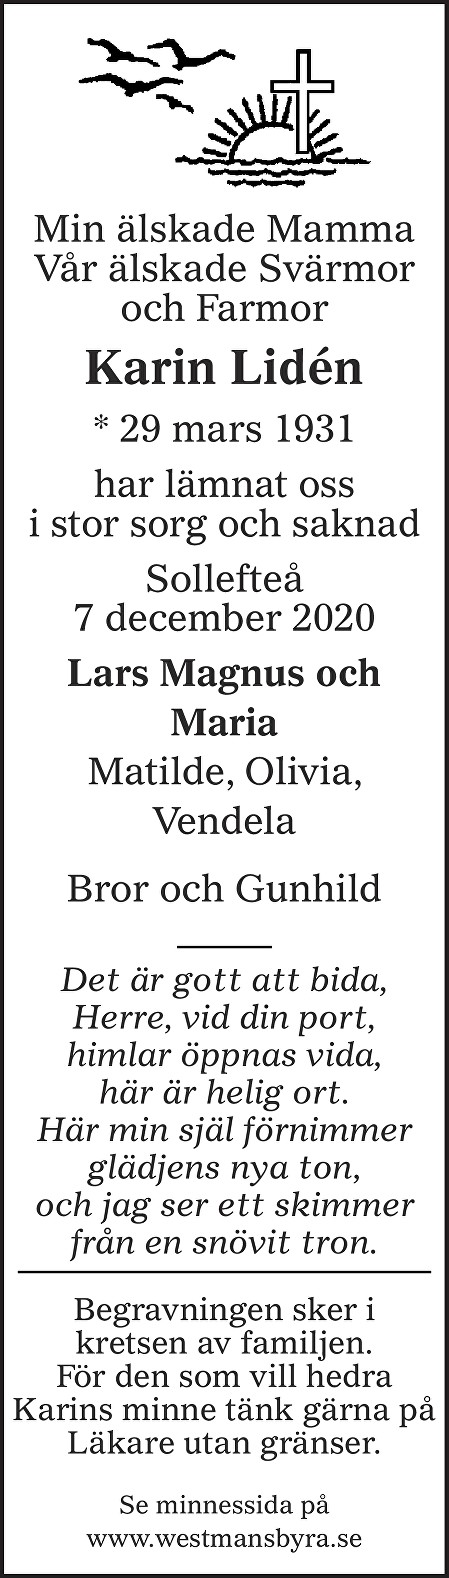 Karin Lidén Death notice